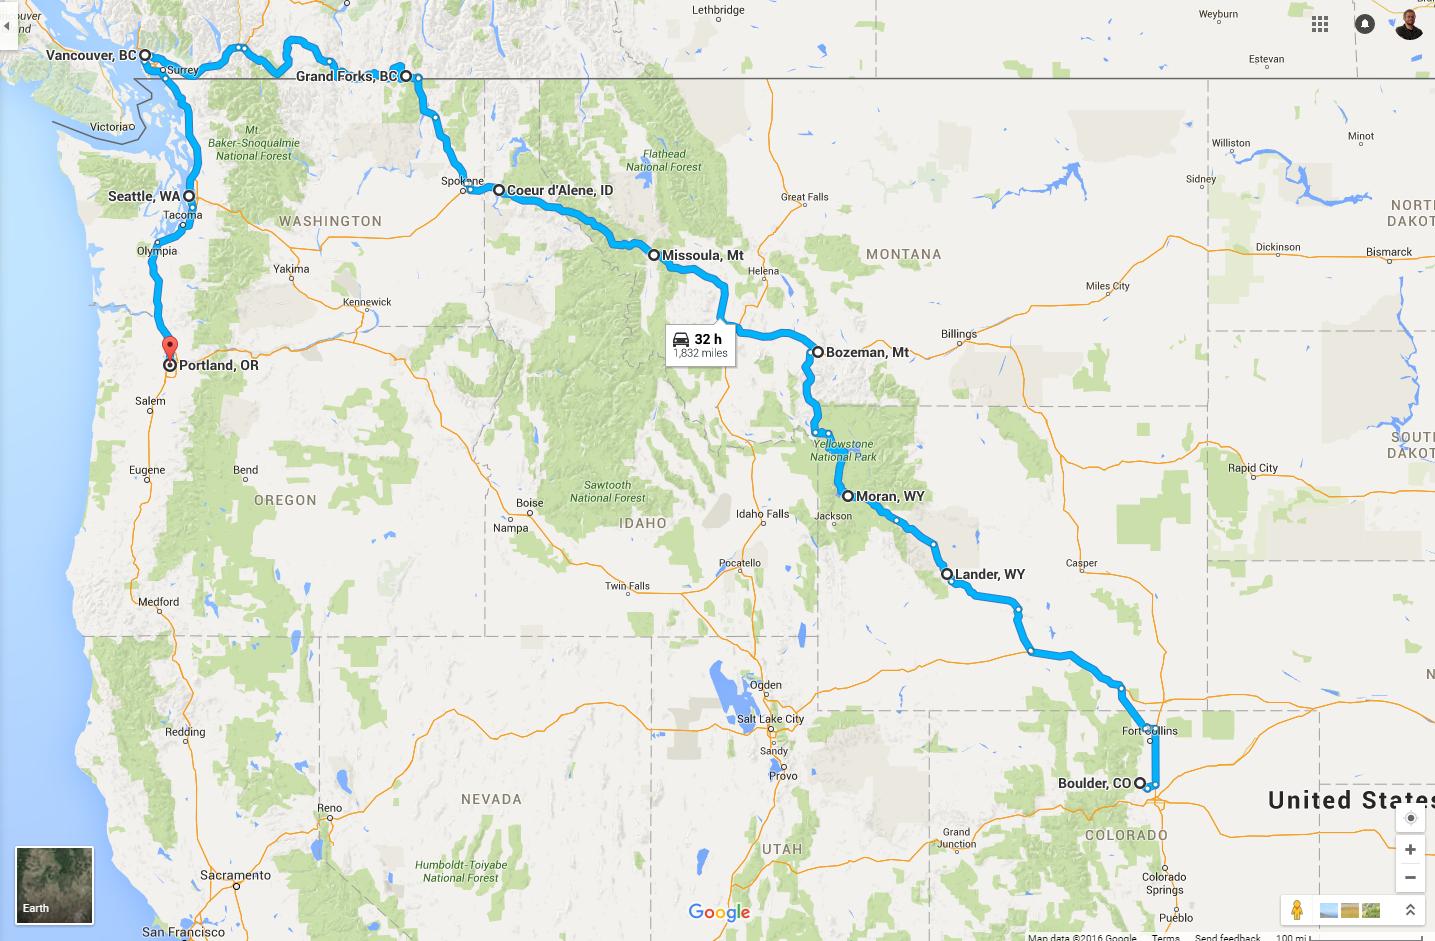 https://www.google.com/maps/dir/Boulder,+CO/Lander,+WY/Moran,+WY/Bozeman,+MT/Missoula,+MT/Coeur+d'Alene,+ID/Grand+Forks,+BC,+Canada/Vancouver,+BC,+Canada/Seattle,+WA/Portland,+OR/@45.5848099,-122.9944629,7.88z/data=!4m72!4m71!1m5!1m1!1s0x876b8d4e278dafd3:0xc8393b7ca01b8058!2m2!1d-105.2705456!2d40.0149856!1m5!1m1!1s0x534cdbd5955700af:0x466a779abe9d3d13!2m2!1d-108.7306725!2d42.833014!1m5!1m1!1s0x53525c81015399a9:0x1394ba66212642b!2m2!1d-110.508053!2d43.8416798!1m5!1m1!1s0x5345444c4fba8813:0x63f5d064f73b60aa!2m2!1d-111.0429339!2d45.6769979!1m5!1m1!1s0x535dcc2a50f367cb:0xe9e31277ca94802e!2m2!1d-113.996586!2d46.8787176!1m5!1m1!1s0x5361b4f8ba557c8f:0x5fe5995b05bf5290!2m2!1d-116.7804664!2d47.6776832!1m5!1m1!1s0x5362adb7feccb003:0x587df4497a36b354!2m2!1d-118.4451392!2d49.0300946!1m5!1m1!1s0x548673f143a94fb3:0xbb9196ea9b81f38b!2m2!1d-123.1207375!2d49.2827291!1m15!1m1!1s0x5490102c93e83355:0x102565466944d59a!2m2!1d-122.3320708!2d47.6062095!3m4!1m2!1d-123.8887869!2d46.532957!3s0x5493a6f368a4d5e1:0x42951d752e0a5b4a!3m4!1m2!1d-123.8426893!2d45.9048296!3s0x5494bcd3c20092ef:0x9068c004ed6fbd78!1m5!1m1!1s0x54950b0b7da97427:0x1c36b9e6f6d18591!2m2!1d-122.6764816!2d45.5230622!3e0